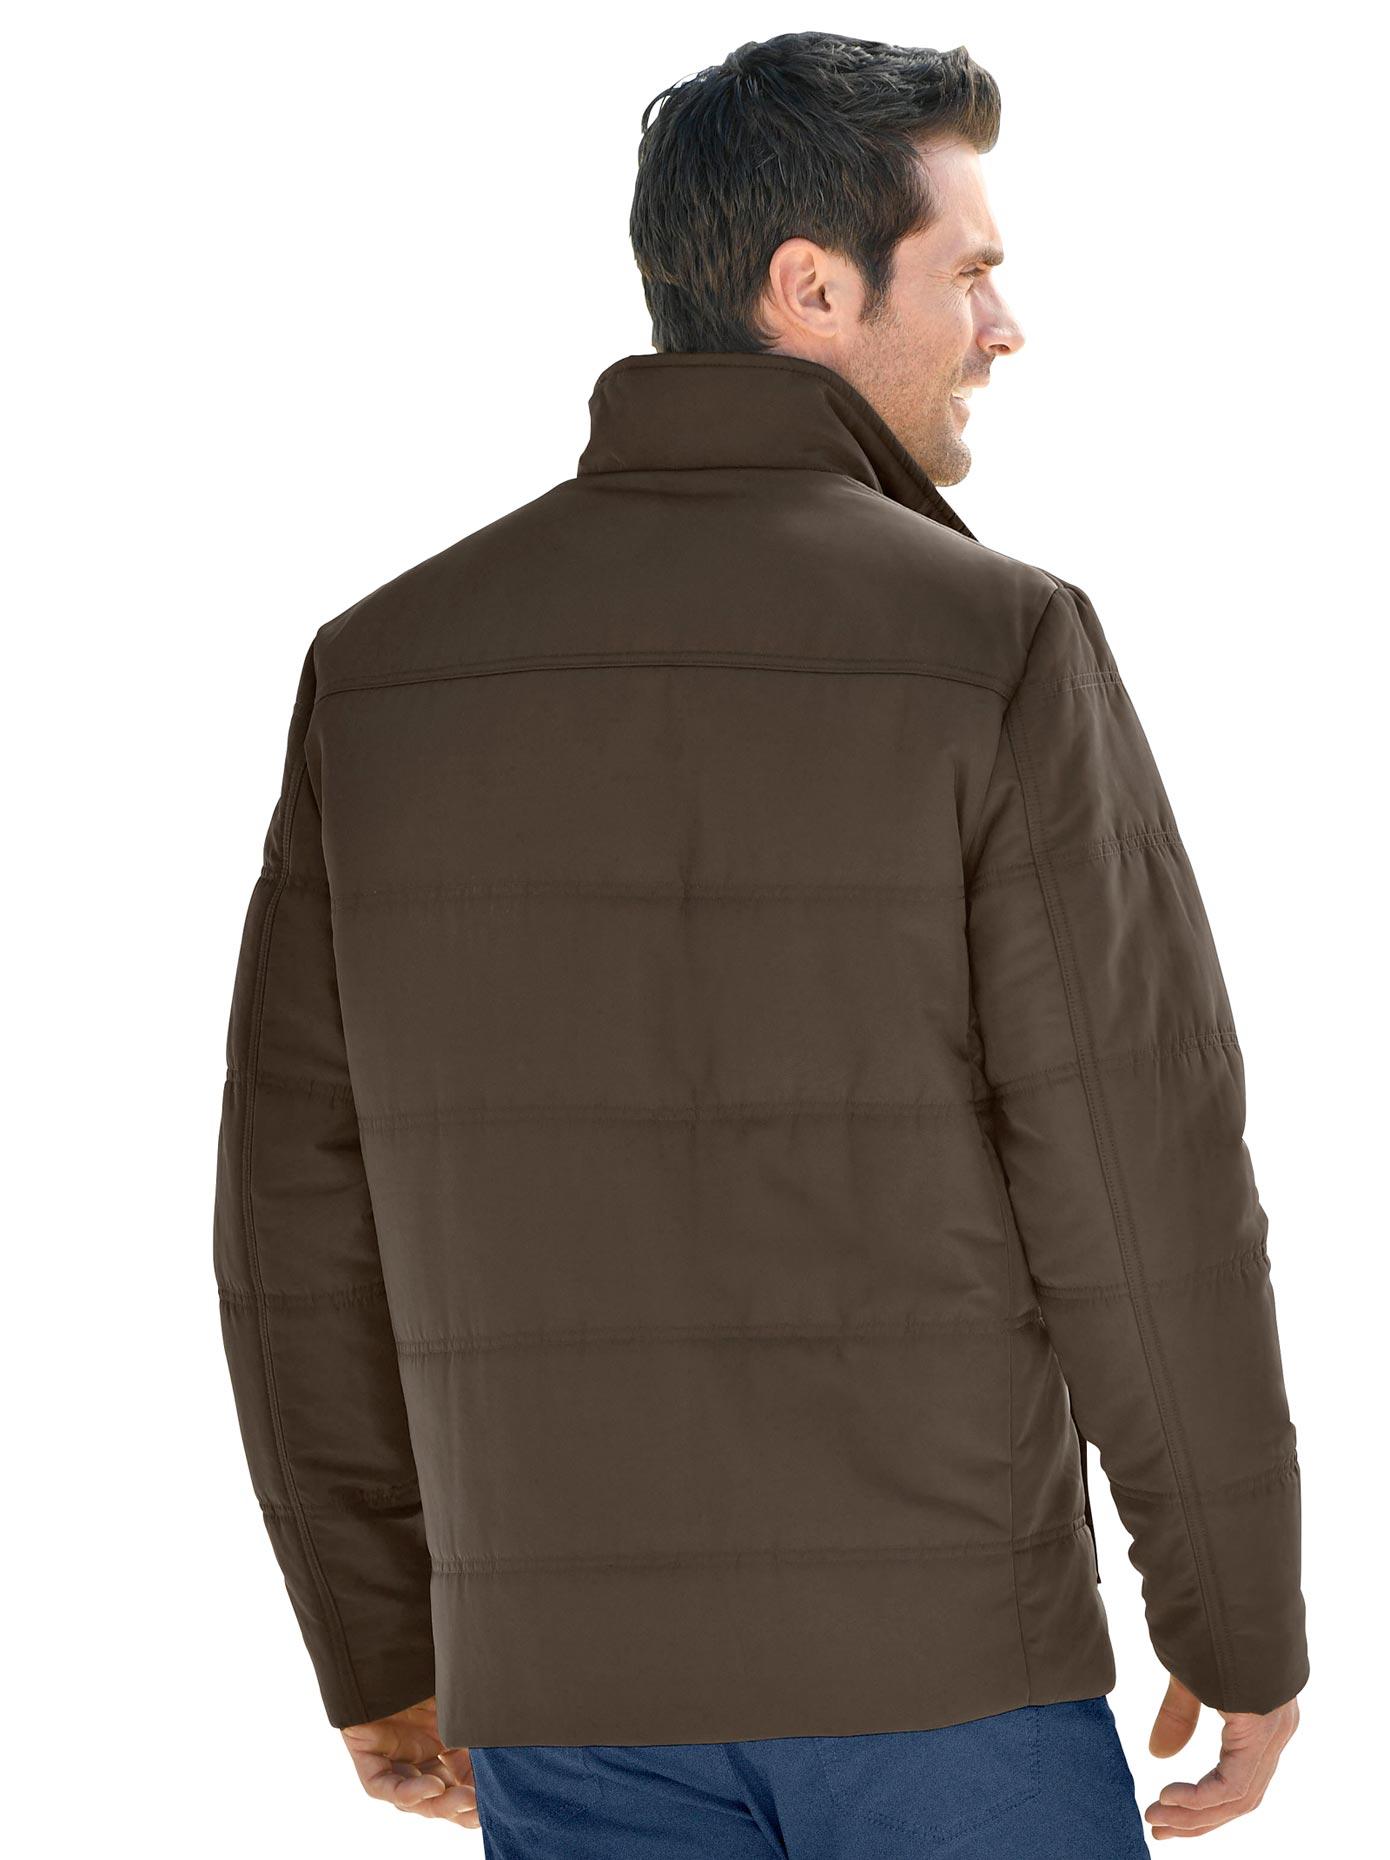 Marco Donati Longjacke mit Patch aus Leder-Imitat am Ärmel | Bekleidung > Jacken > Fieldjackets | marco donati